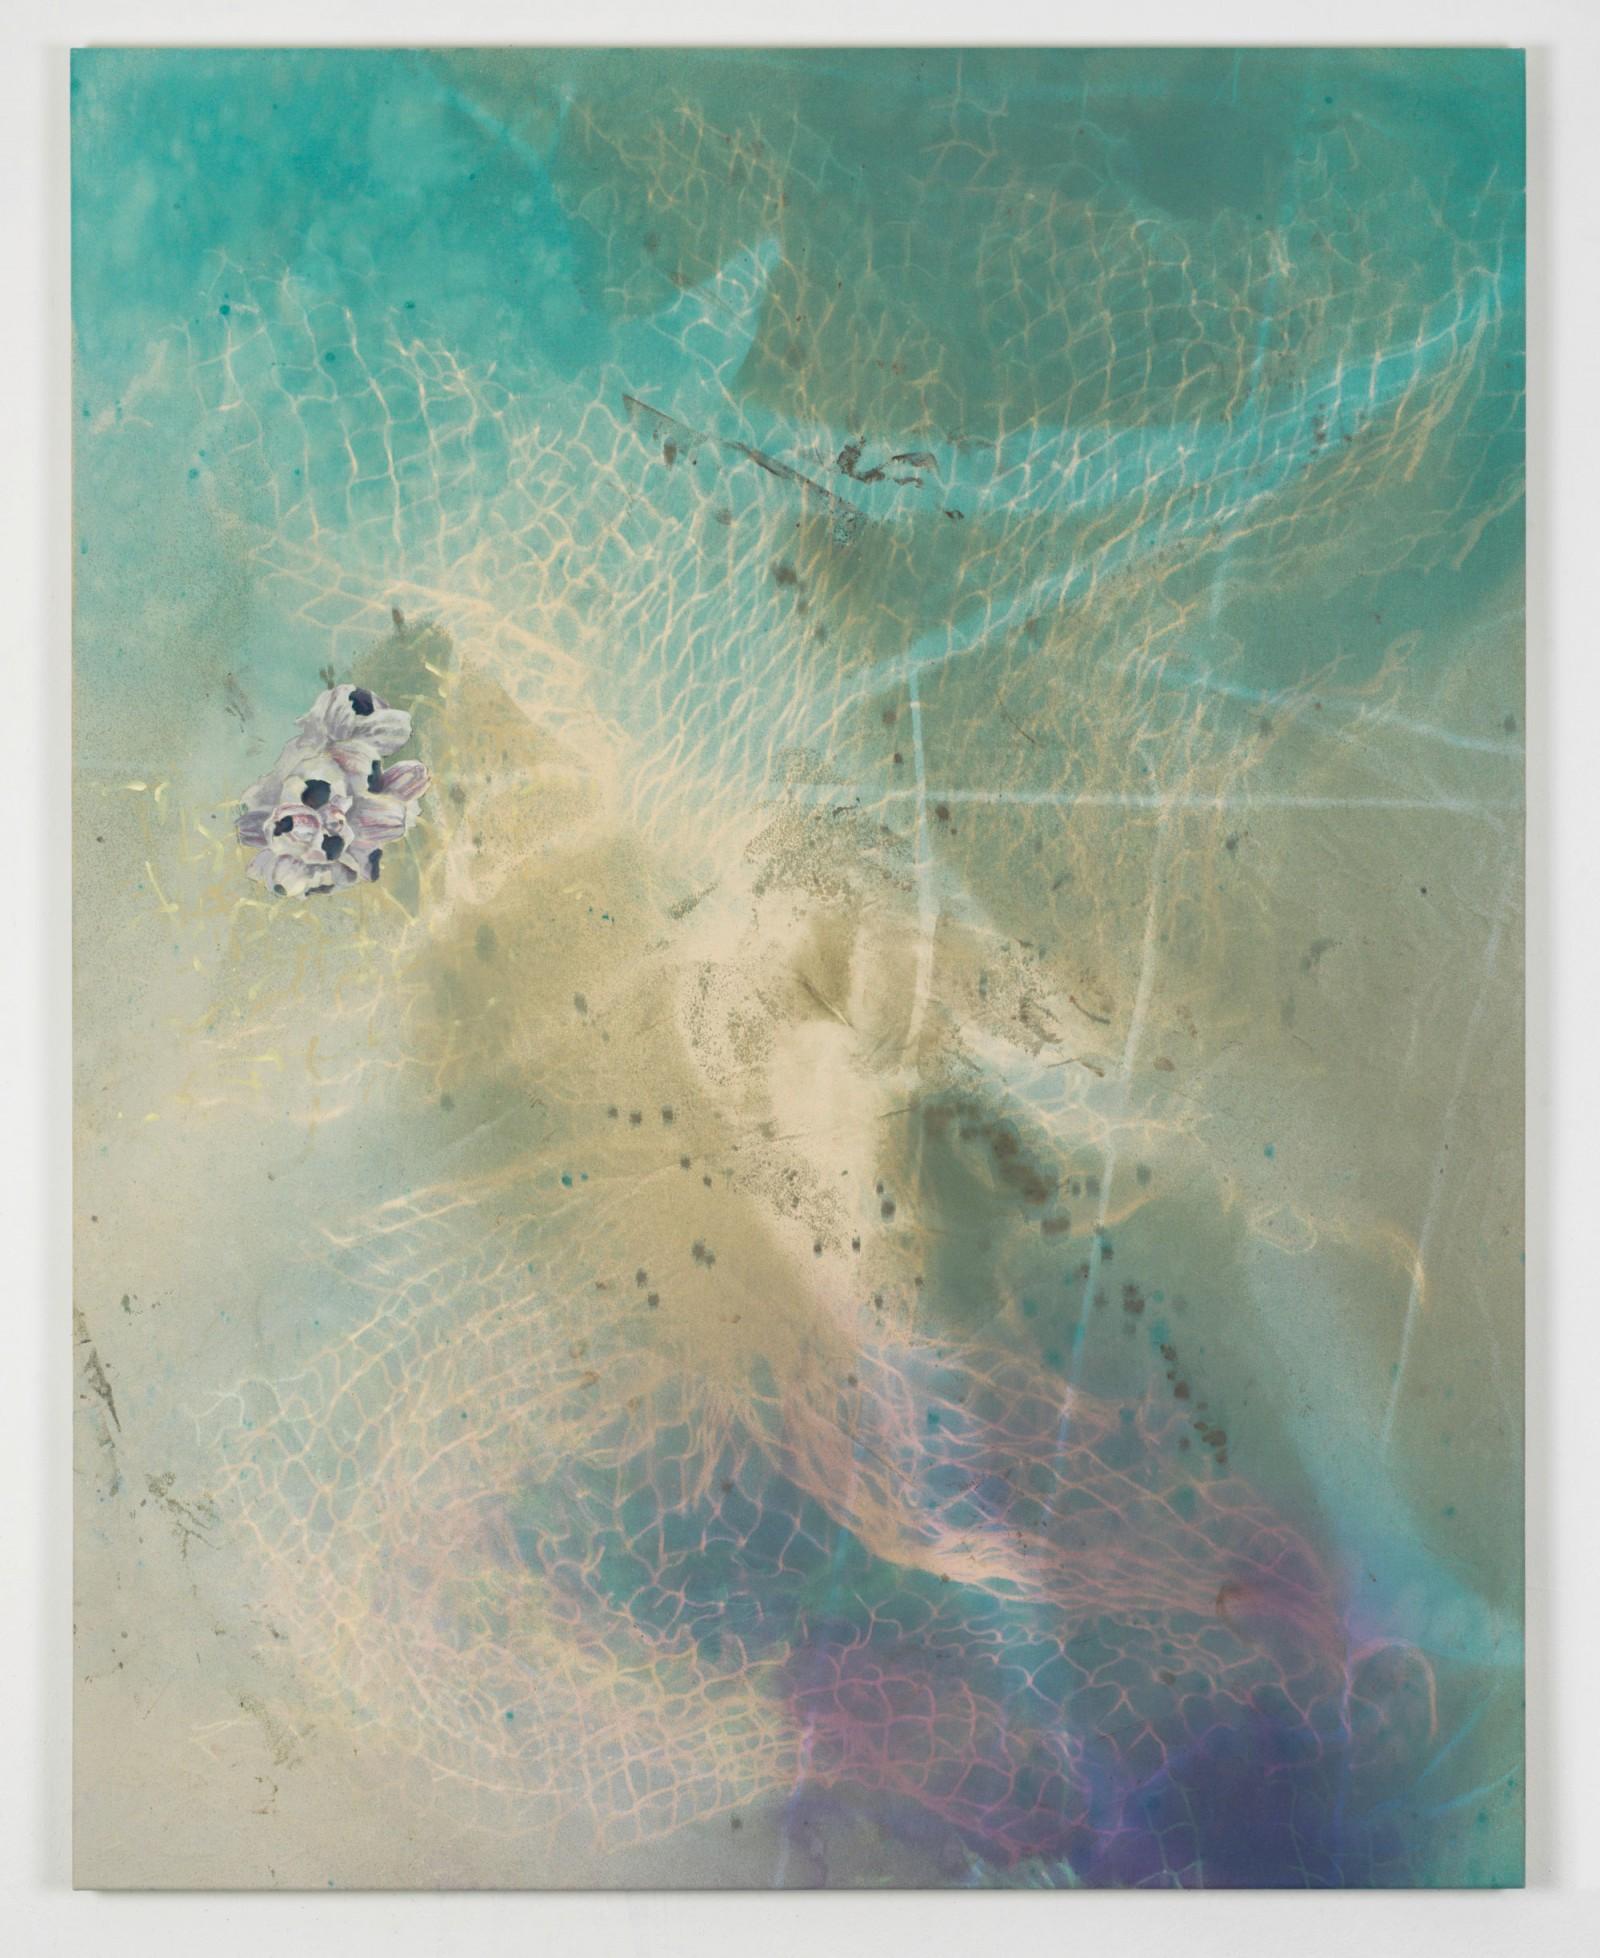 Kim Nekarda: untitled, 2015, vinyl color & body print on cotton, 190 x 150 cm